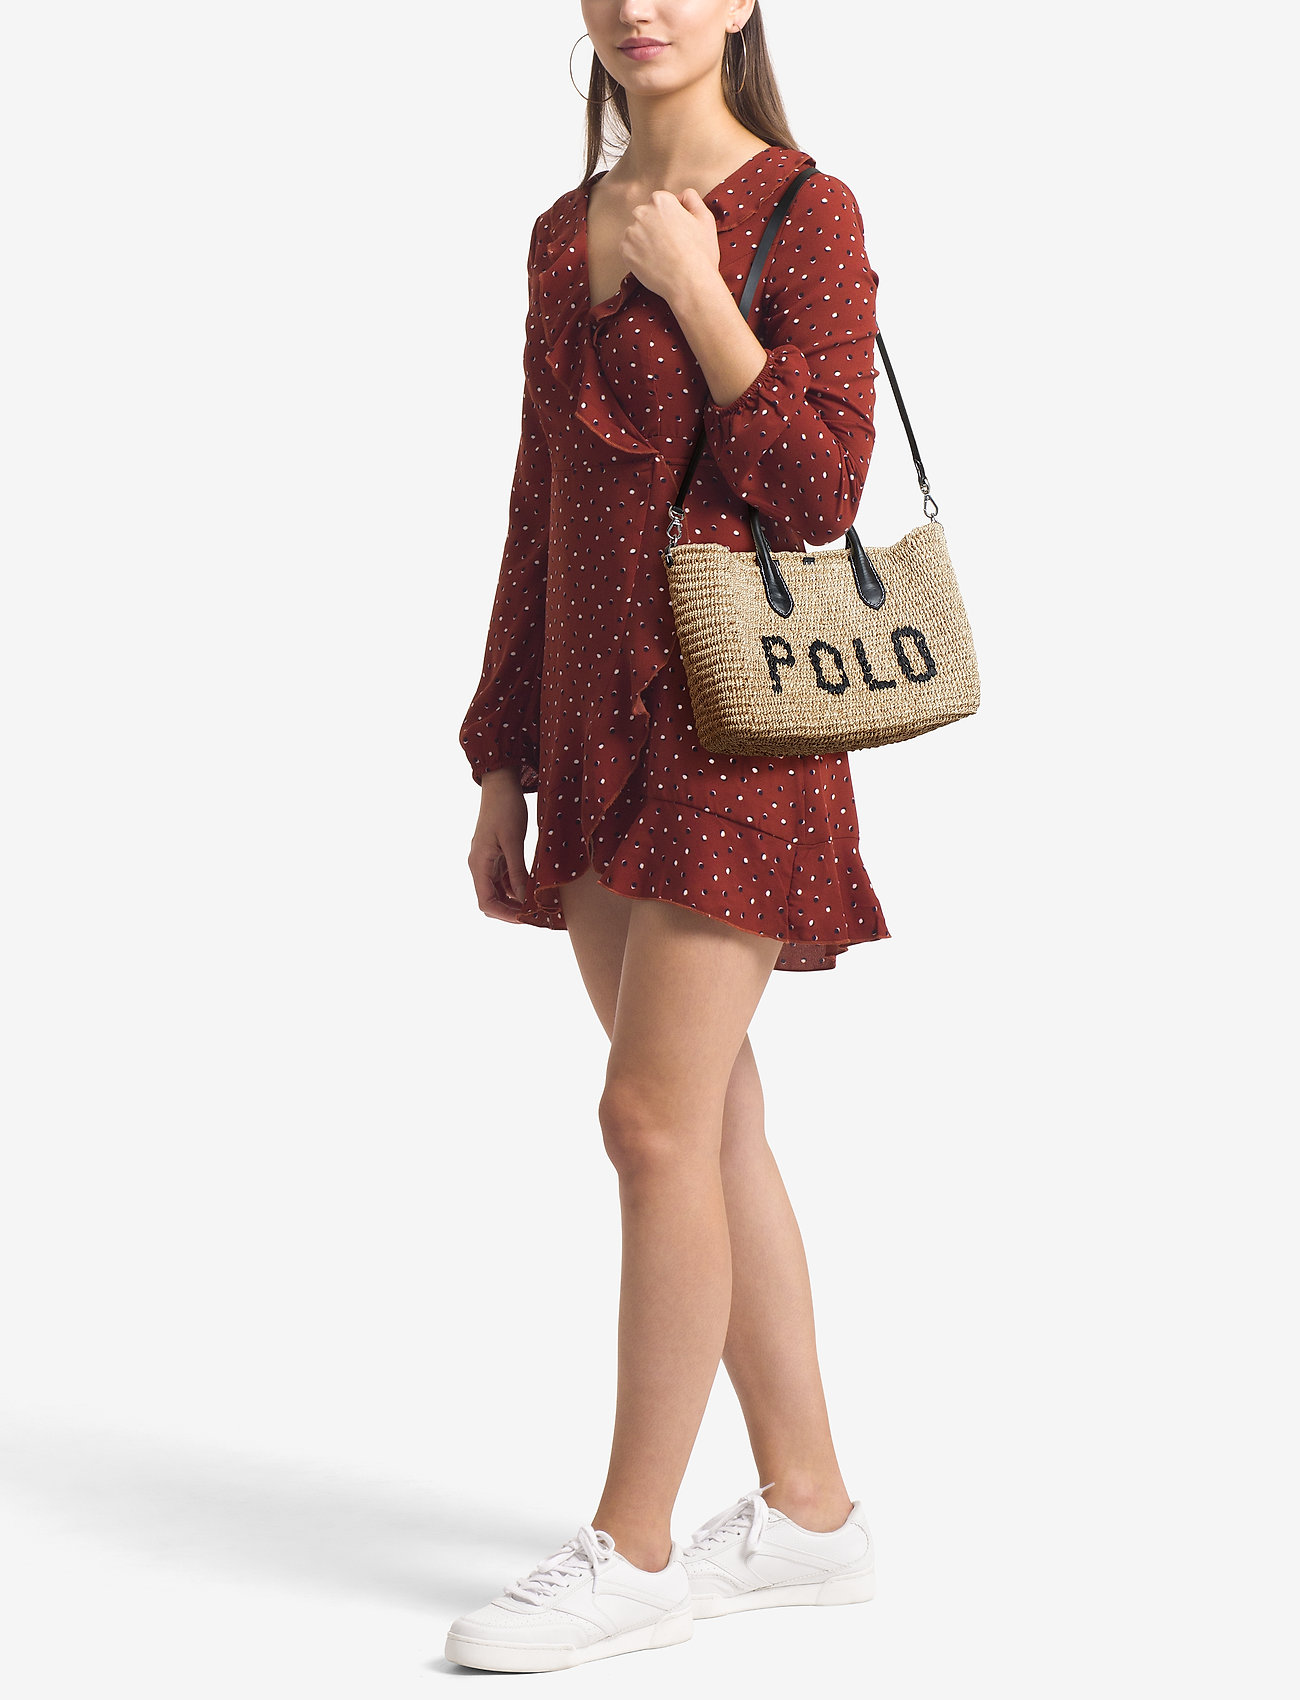 Polo Ralph Lauren STRAW/LEATHER-STRCTRD BSKT-TTE-SMA